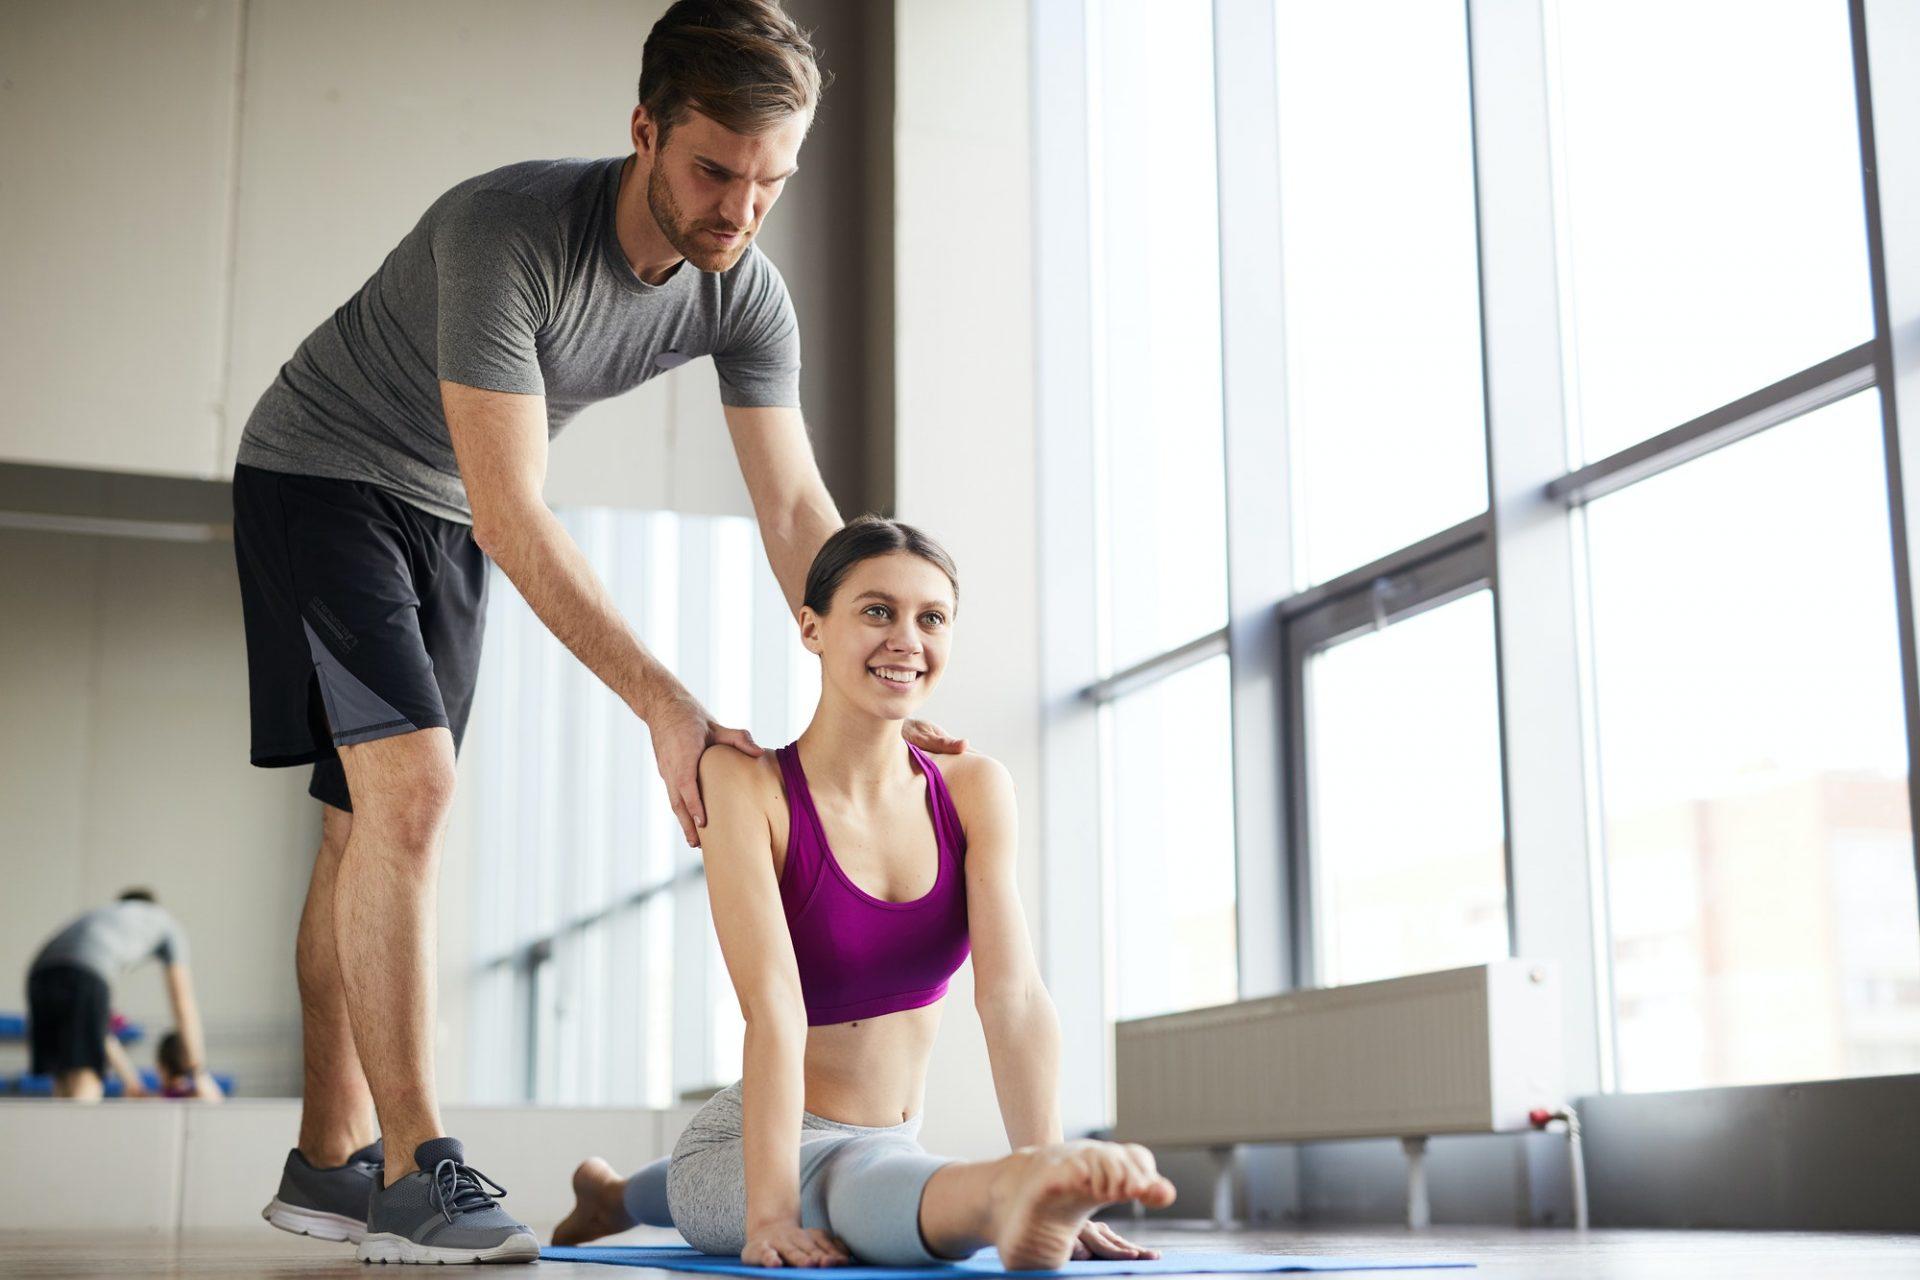 Male pilates coach adjusting back of flexible girl